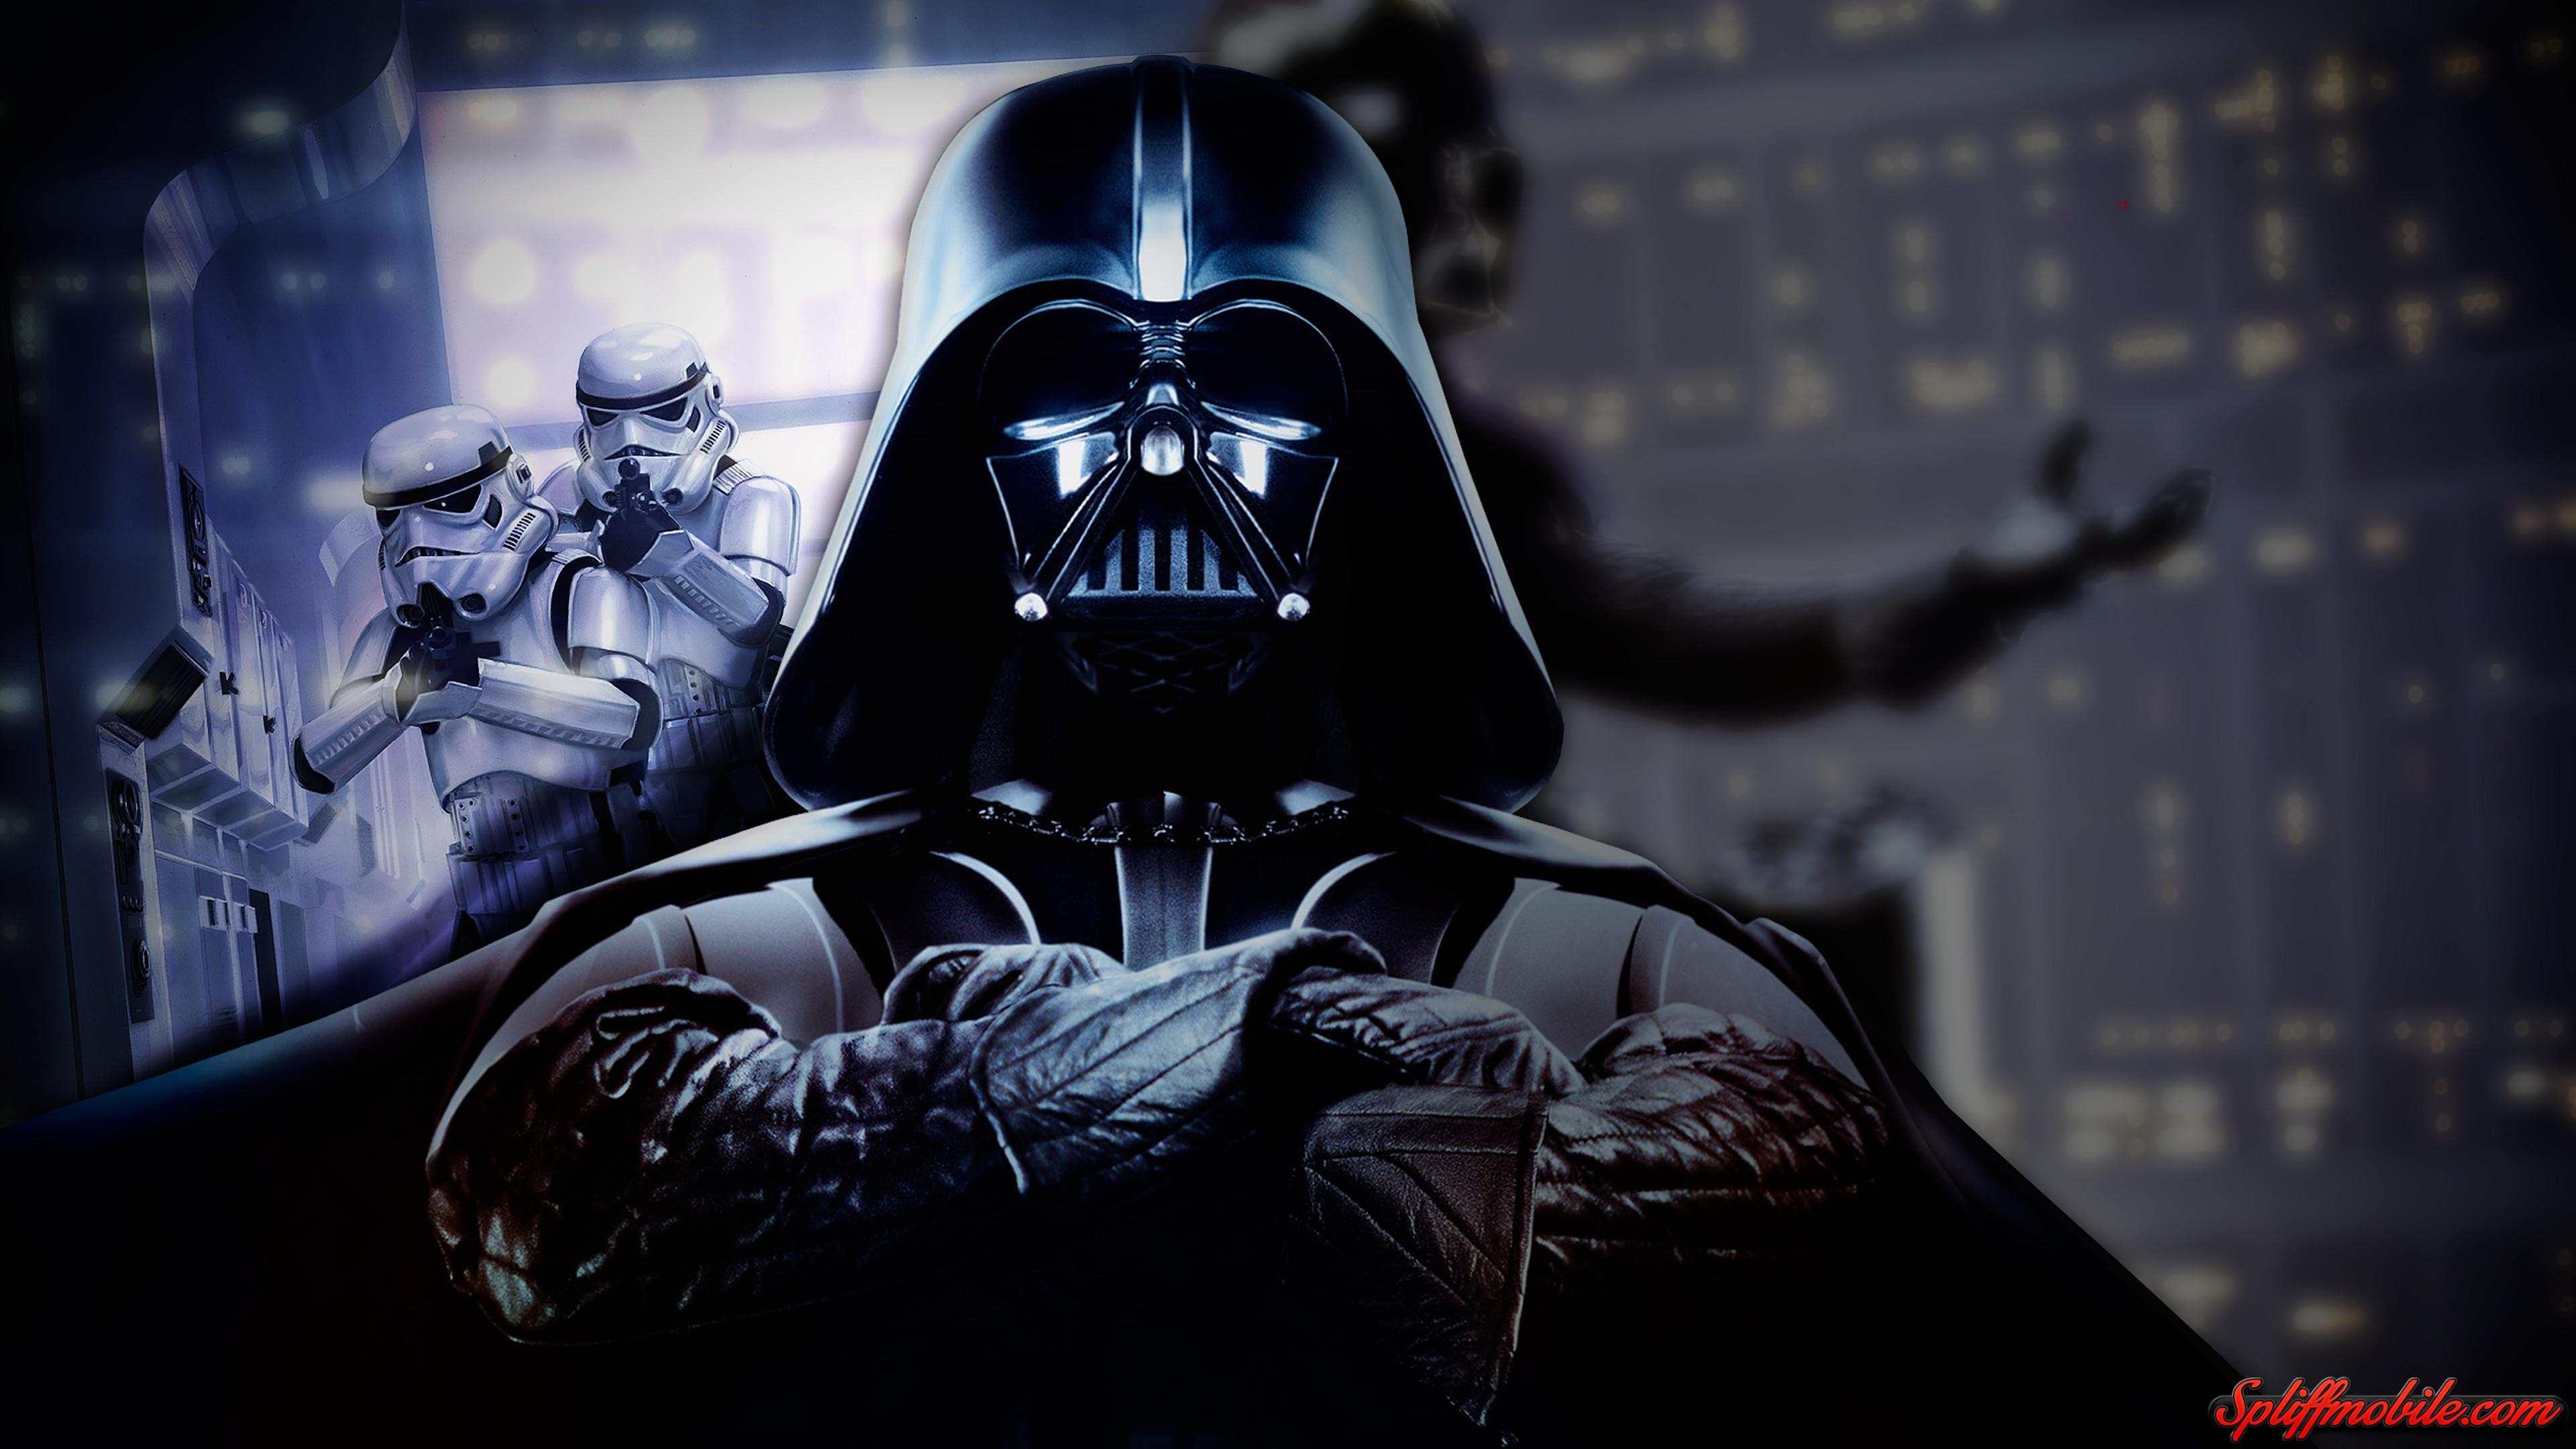 Darth Vader Background 73 Pictures